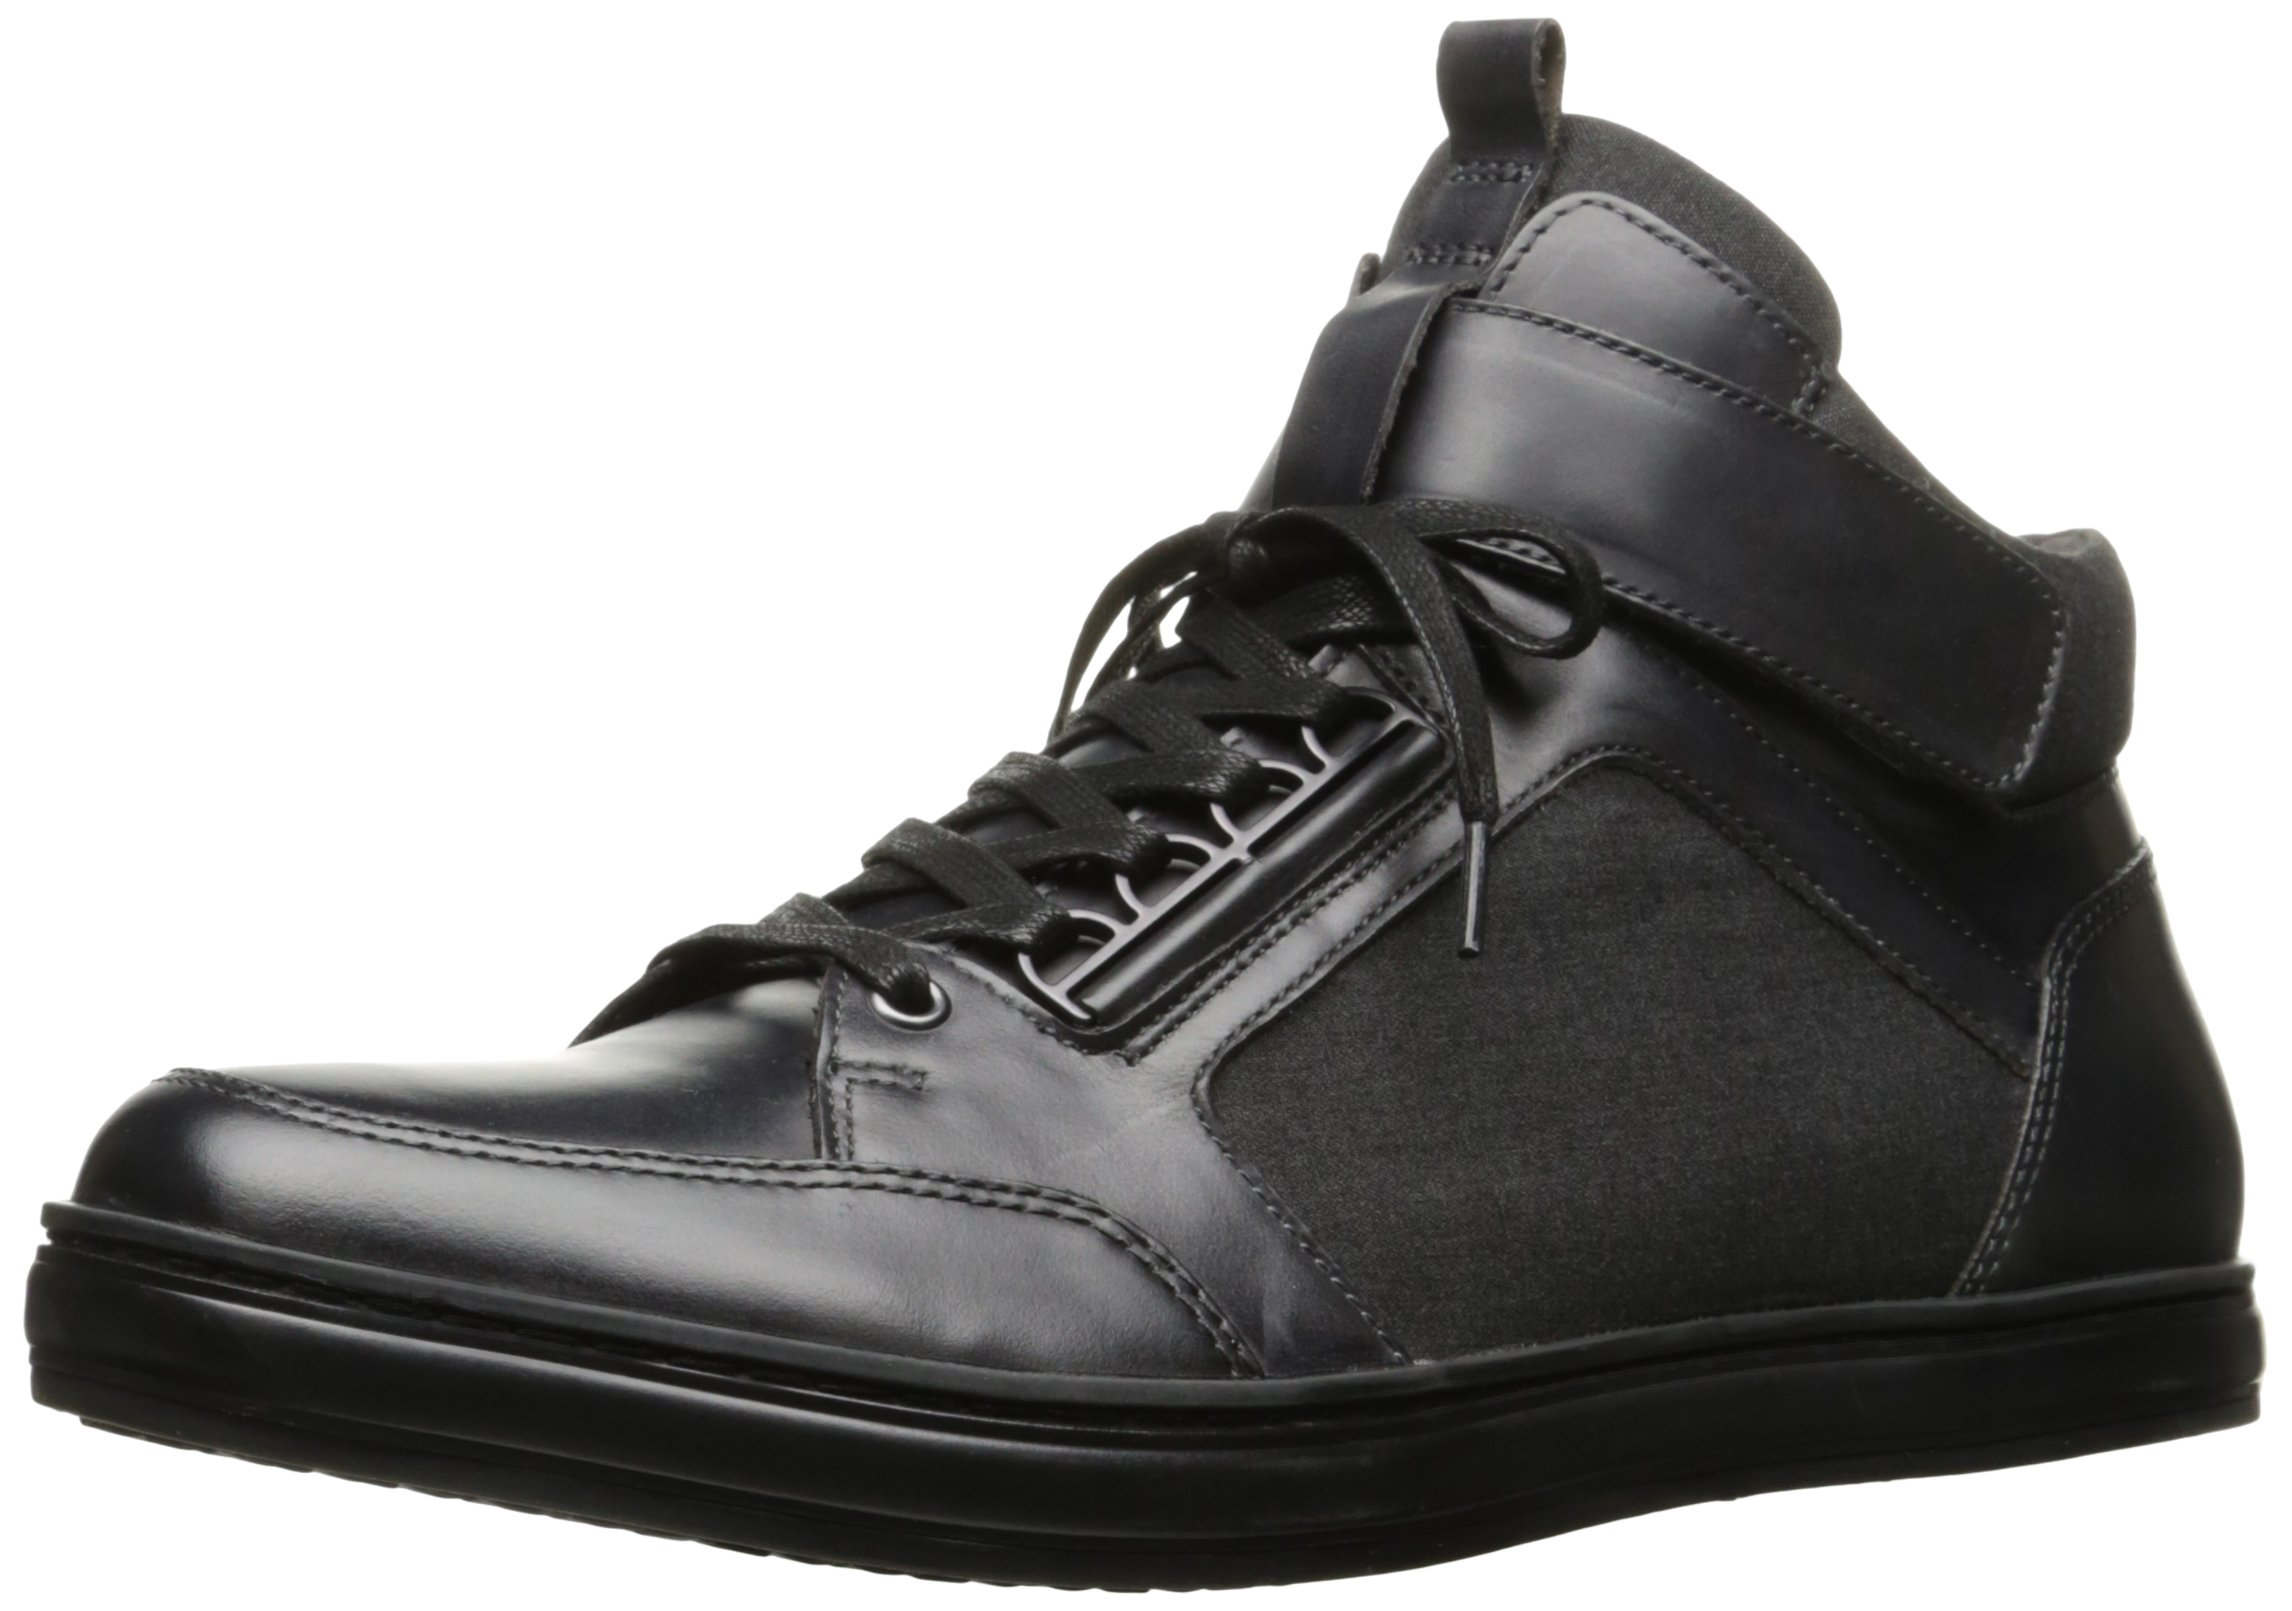 Kenneth Cole New York Men's Brand-y 2D Fashion Sneaker, Grey, 9.5 M US